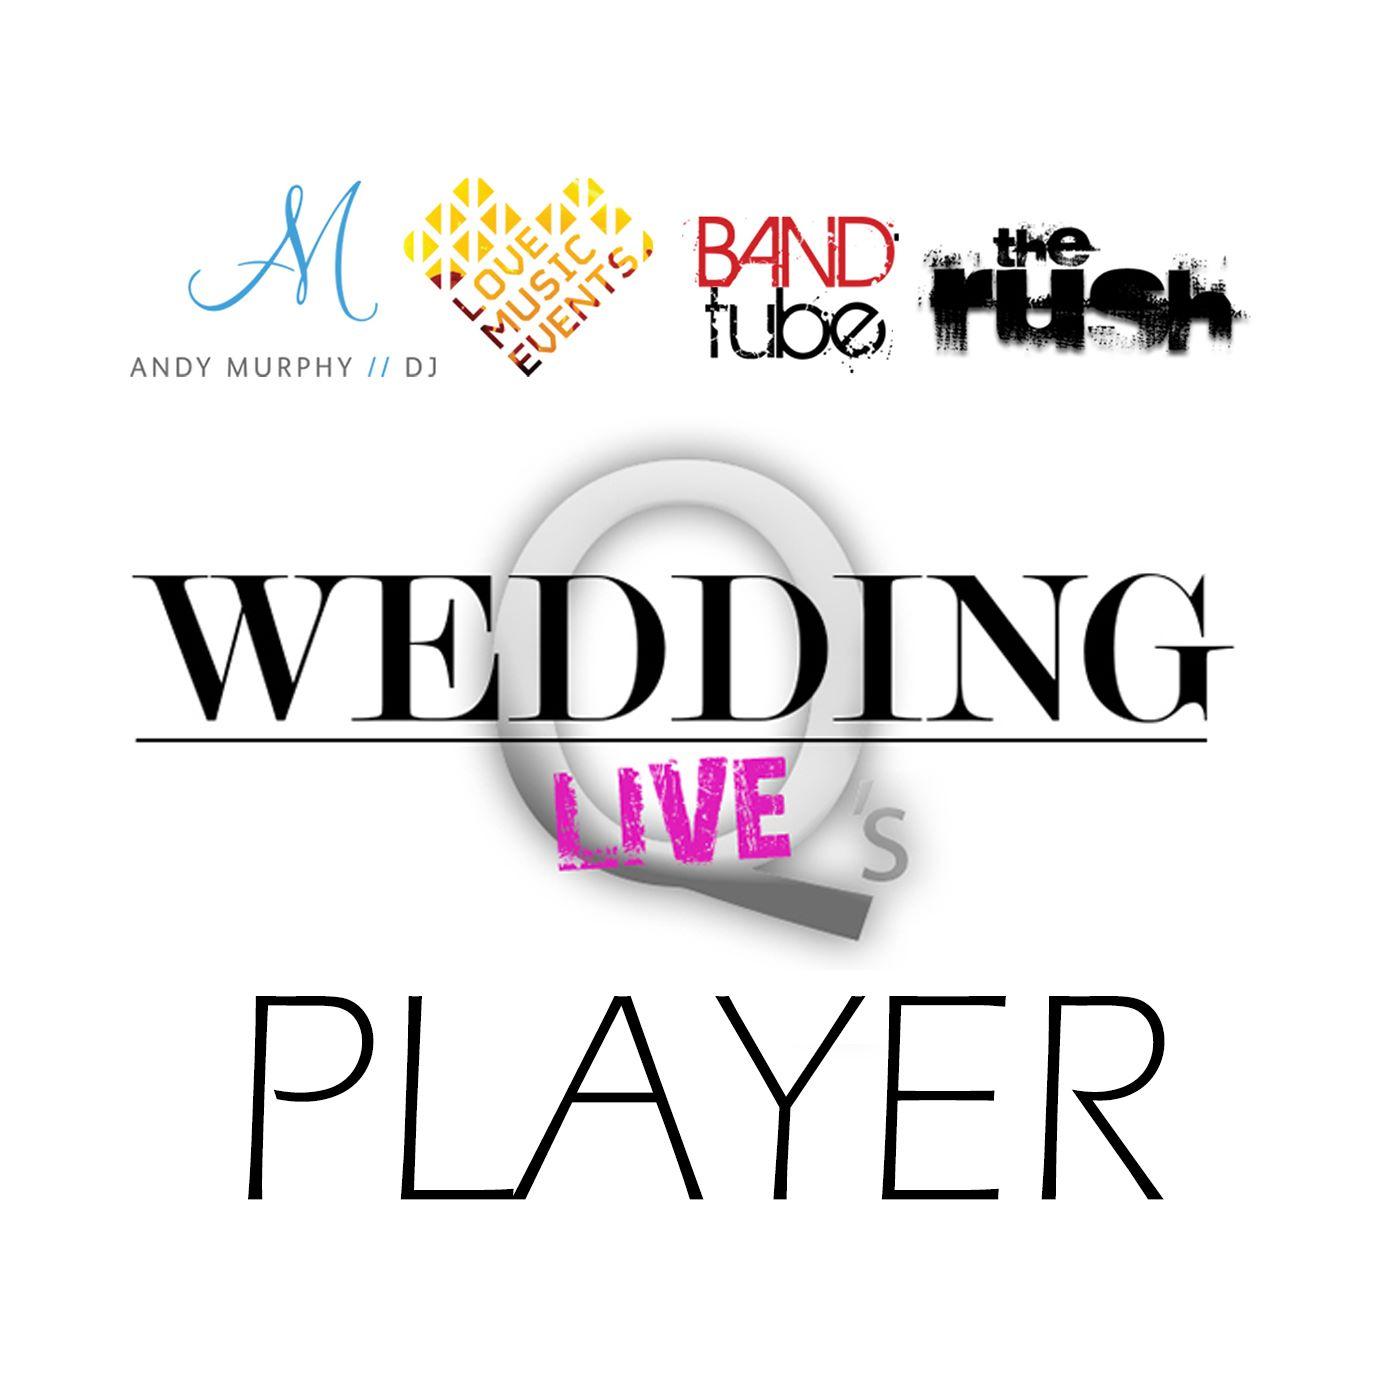 Wedding Qs Live